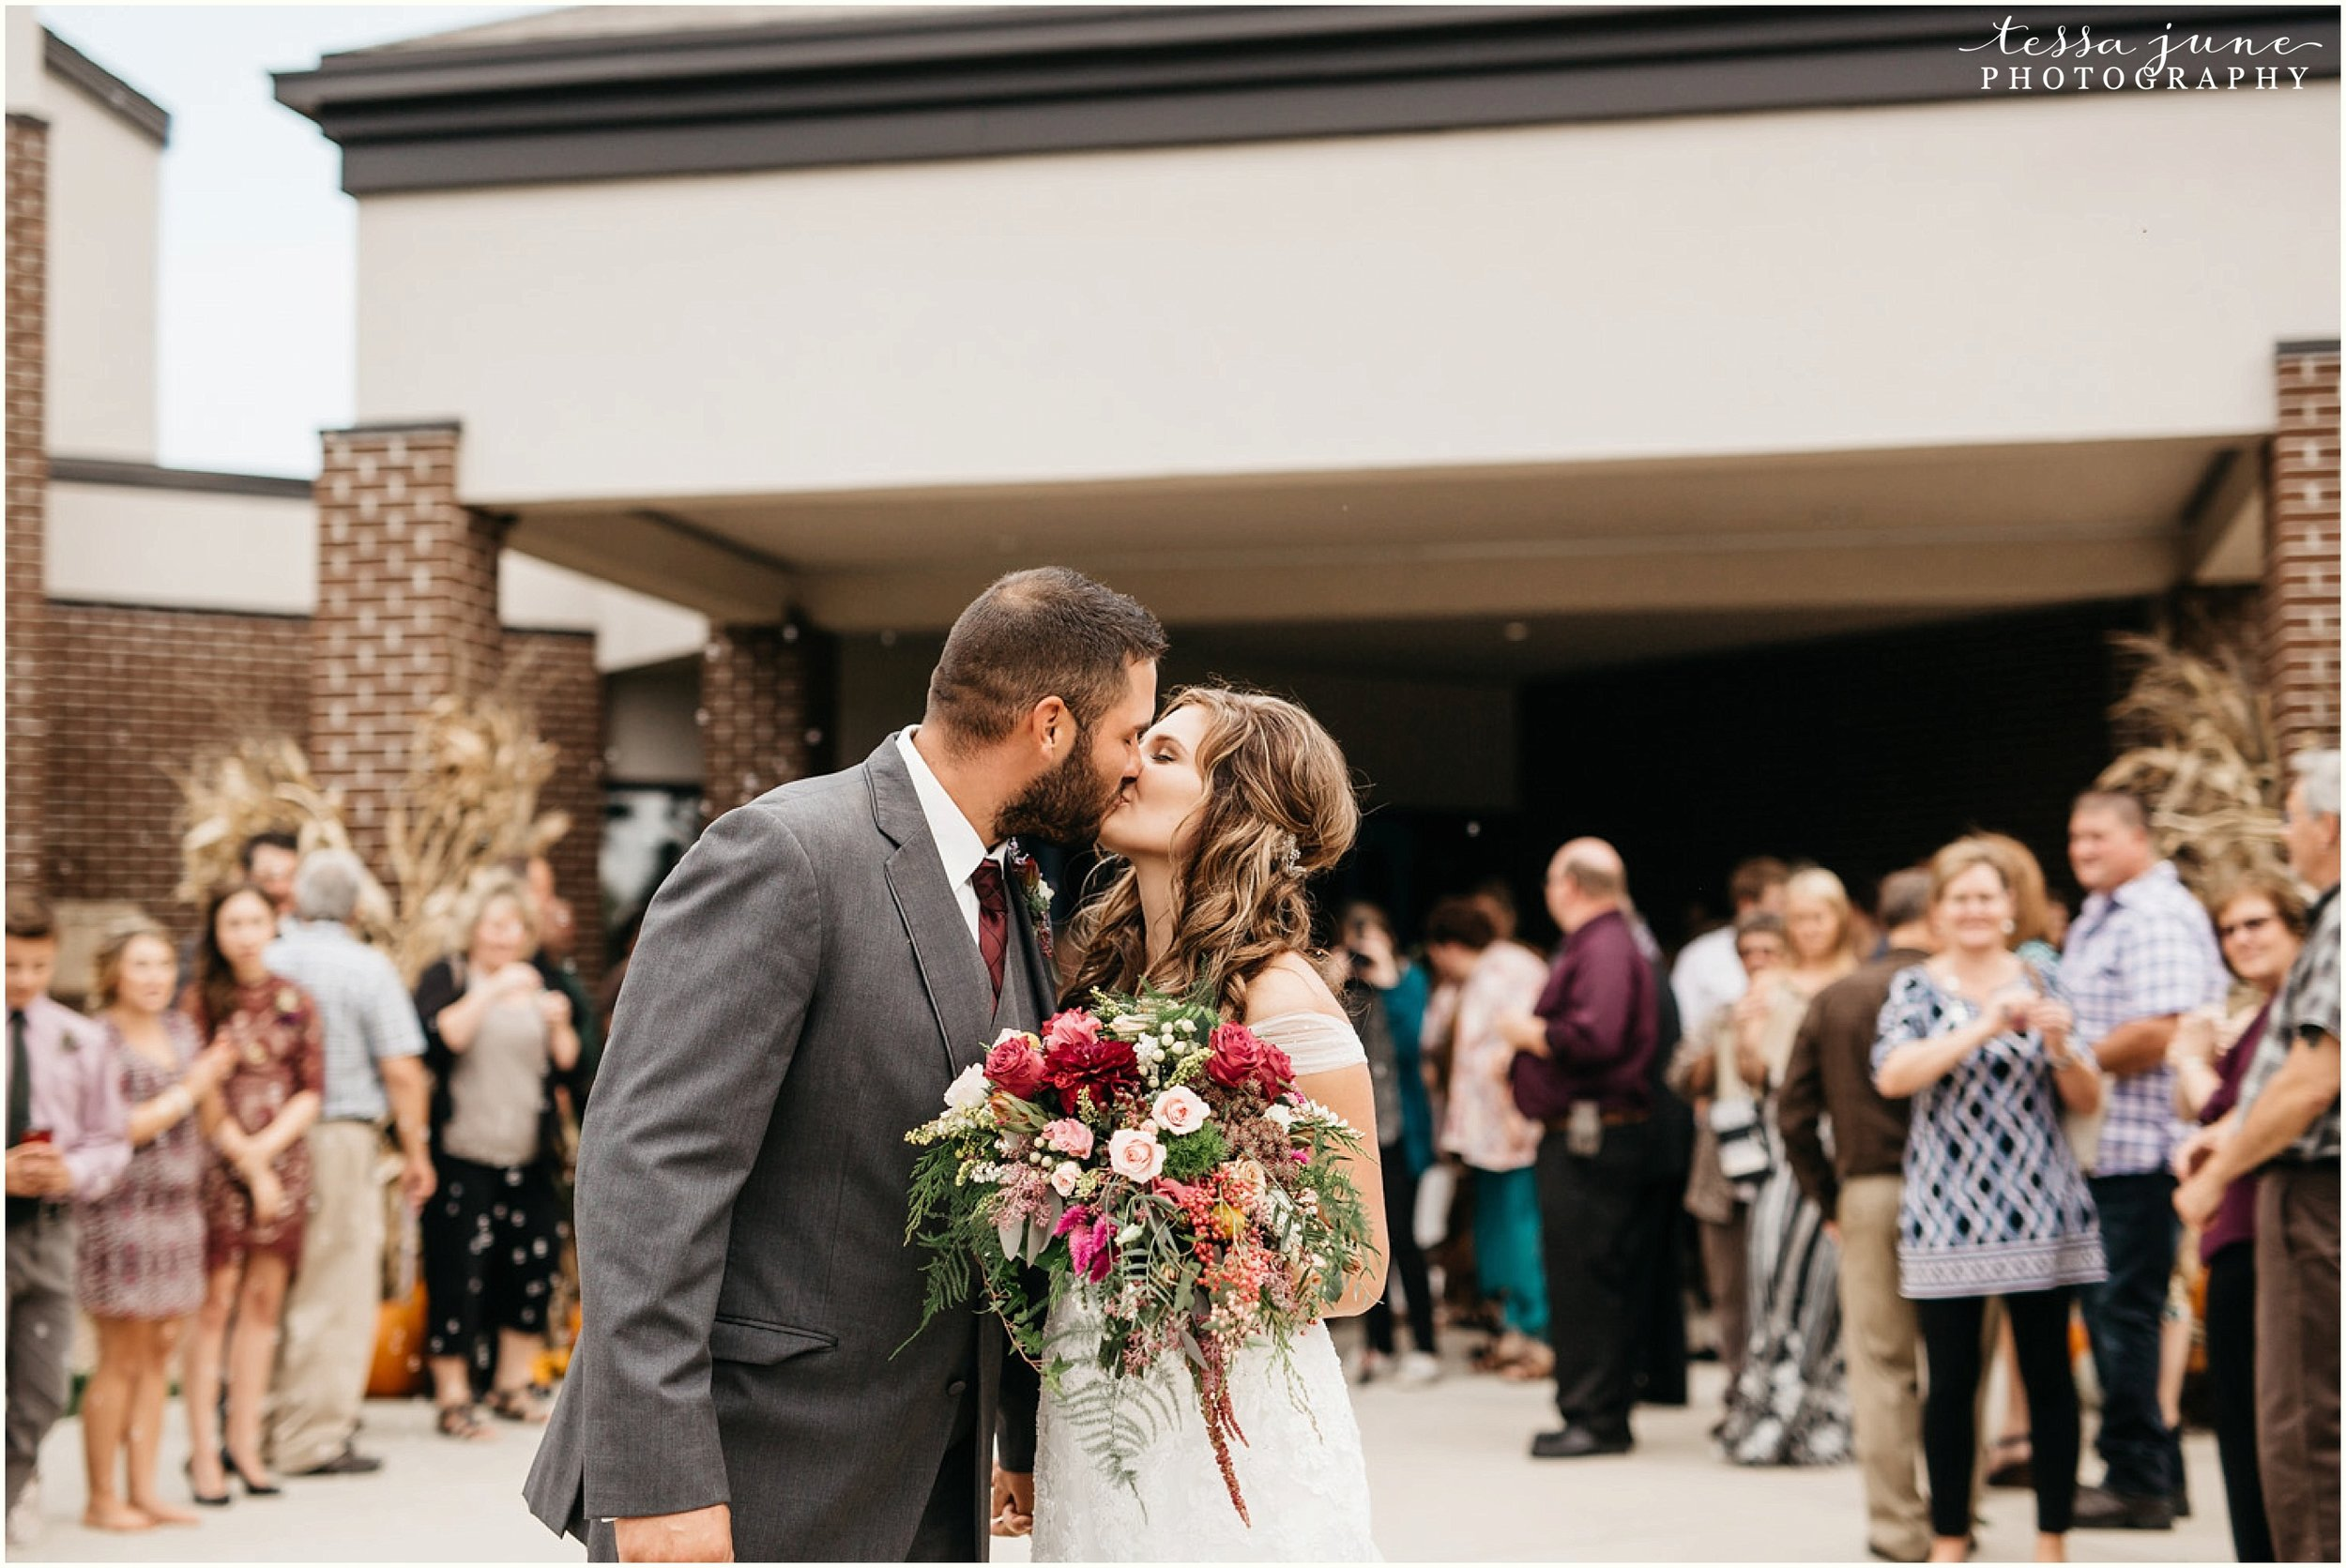 bohemian-minnesota-wedding-mismatched-bridesmaid-dresses-waterfall-st-cloud-tessa-june-photography-122.jpg